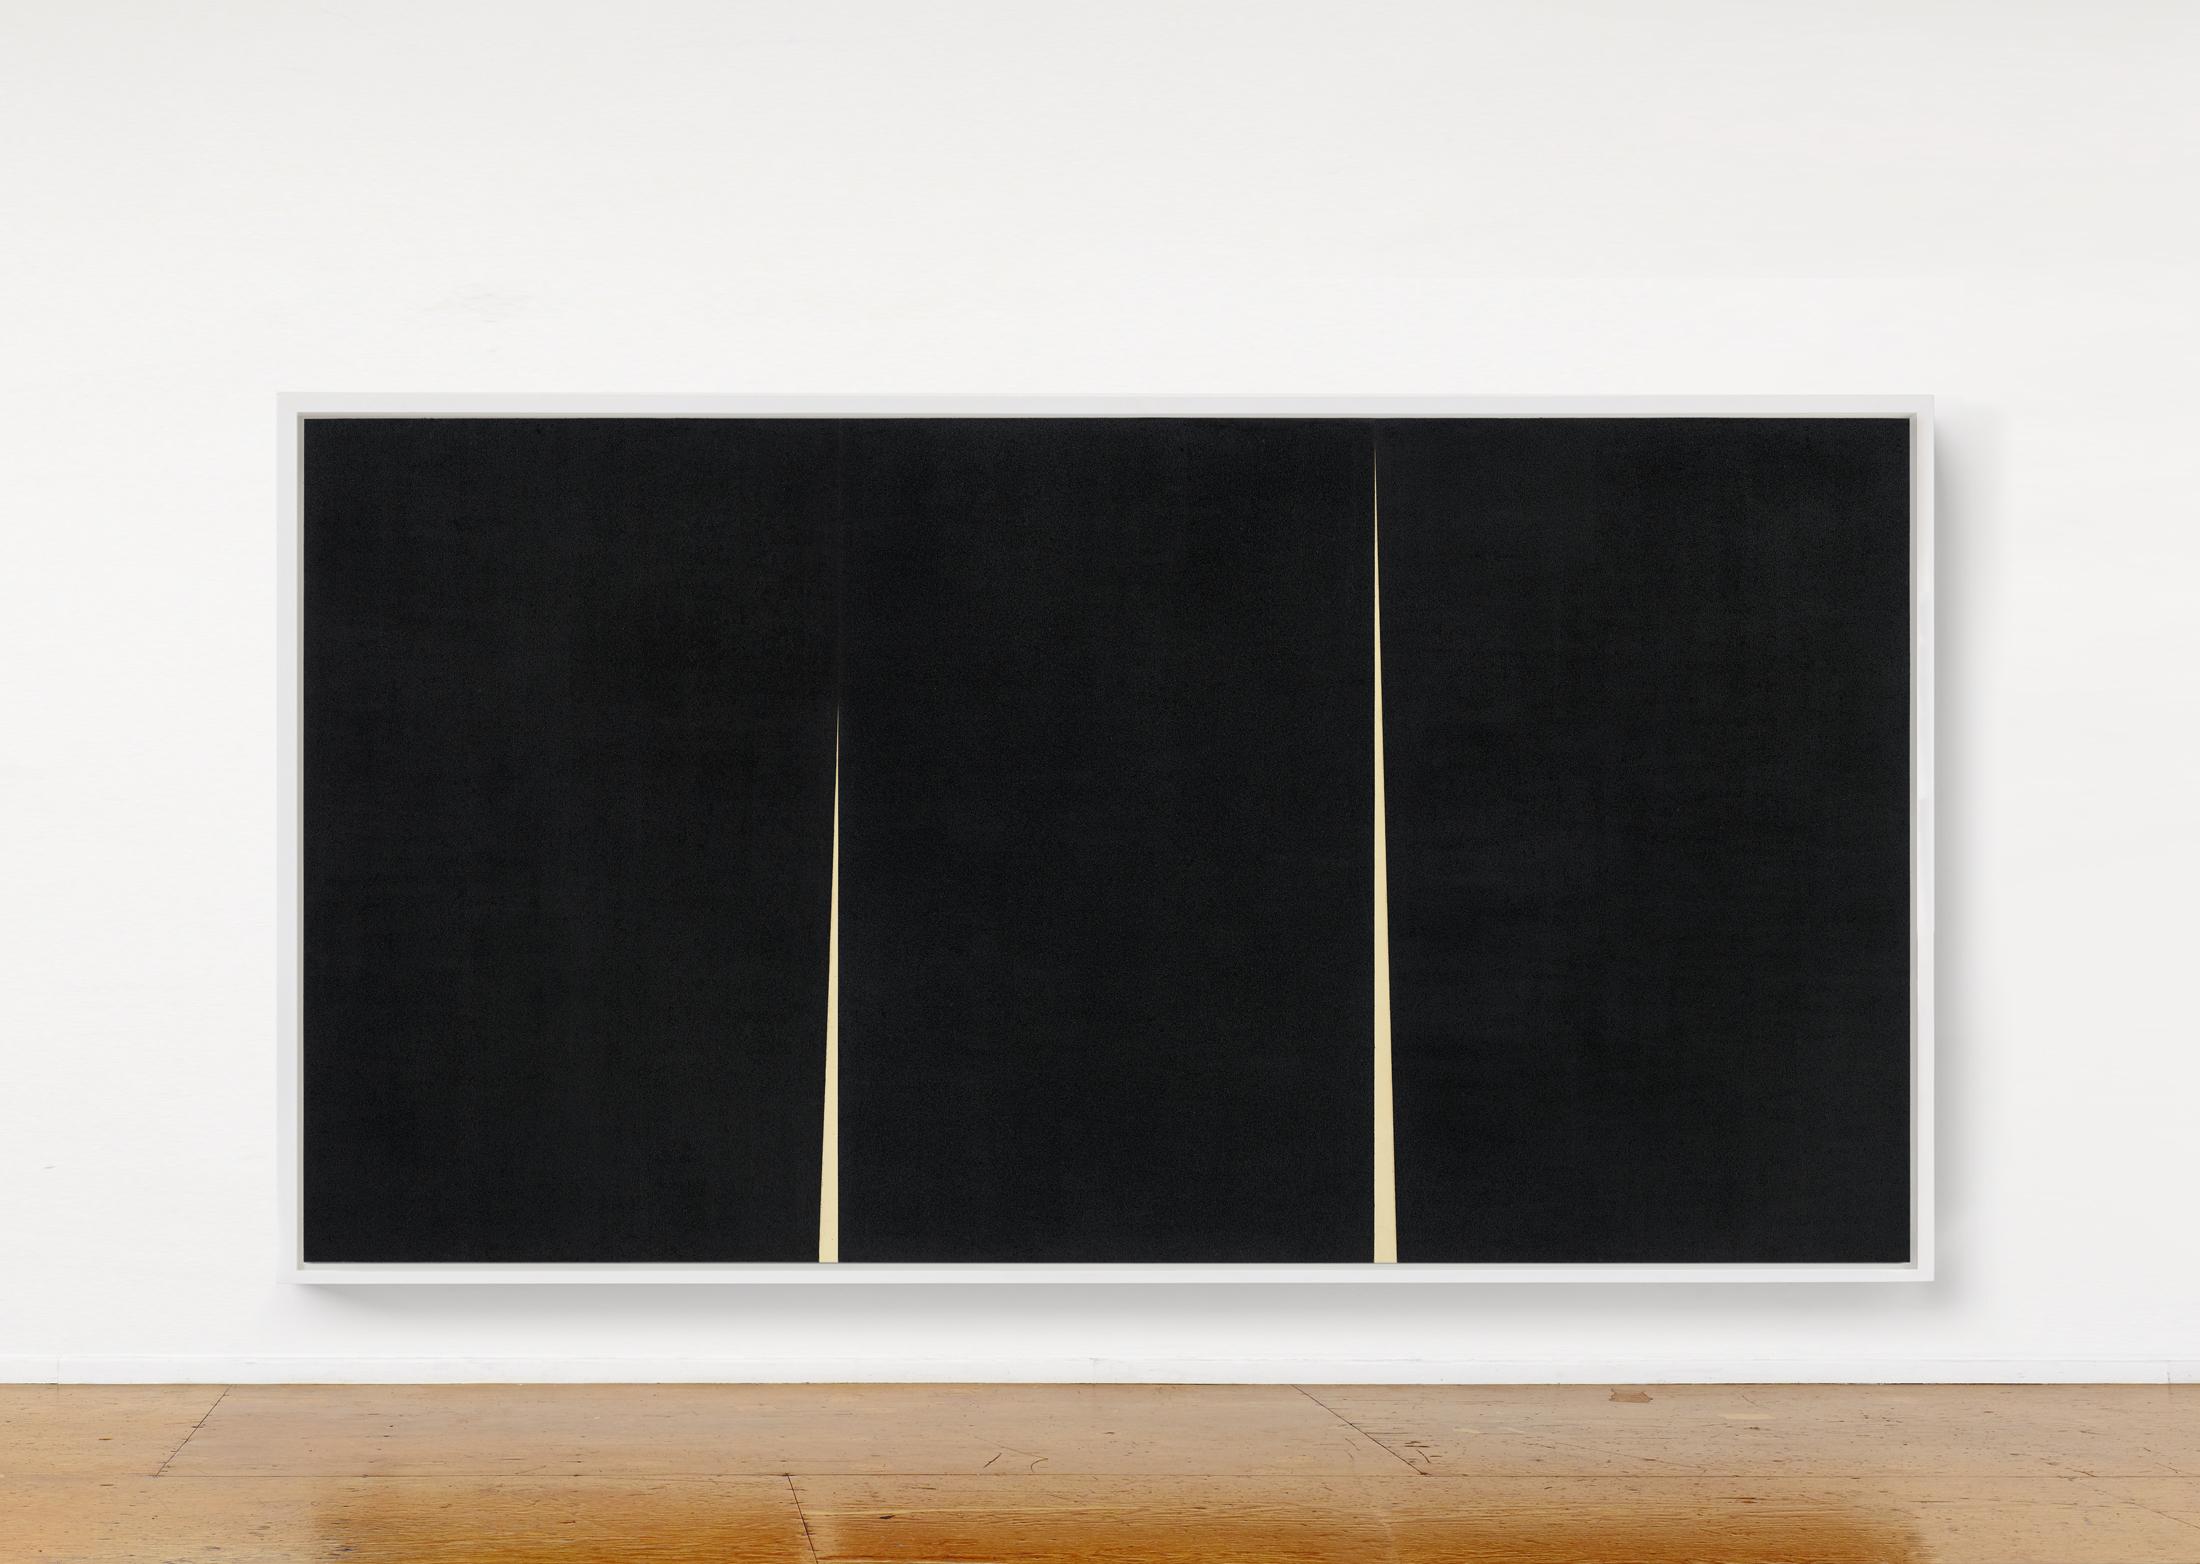 Richard Serra Double Rift IV, 2016. © Richard Serra / Courtesy Galerie Lelong & Co.